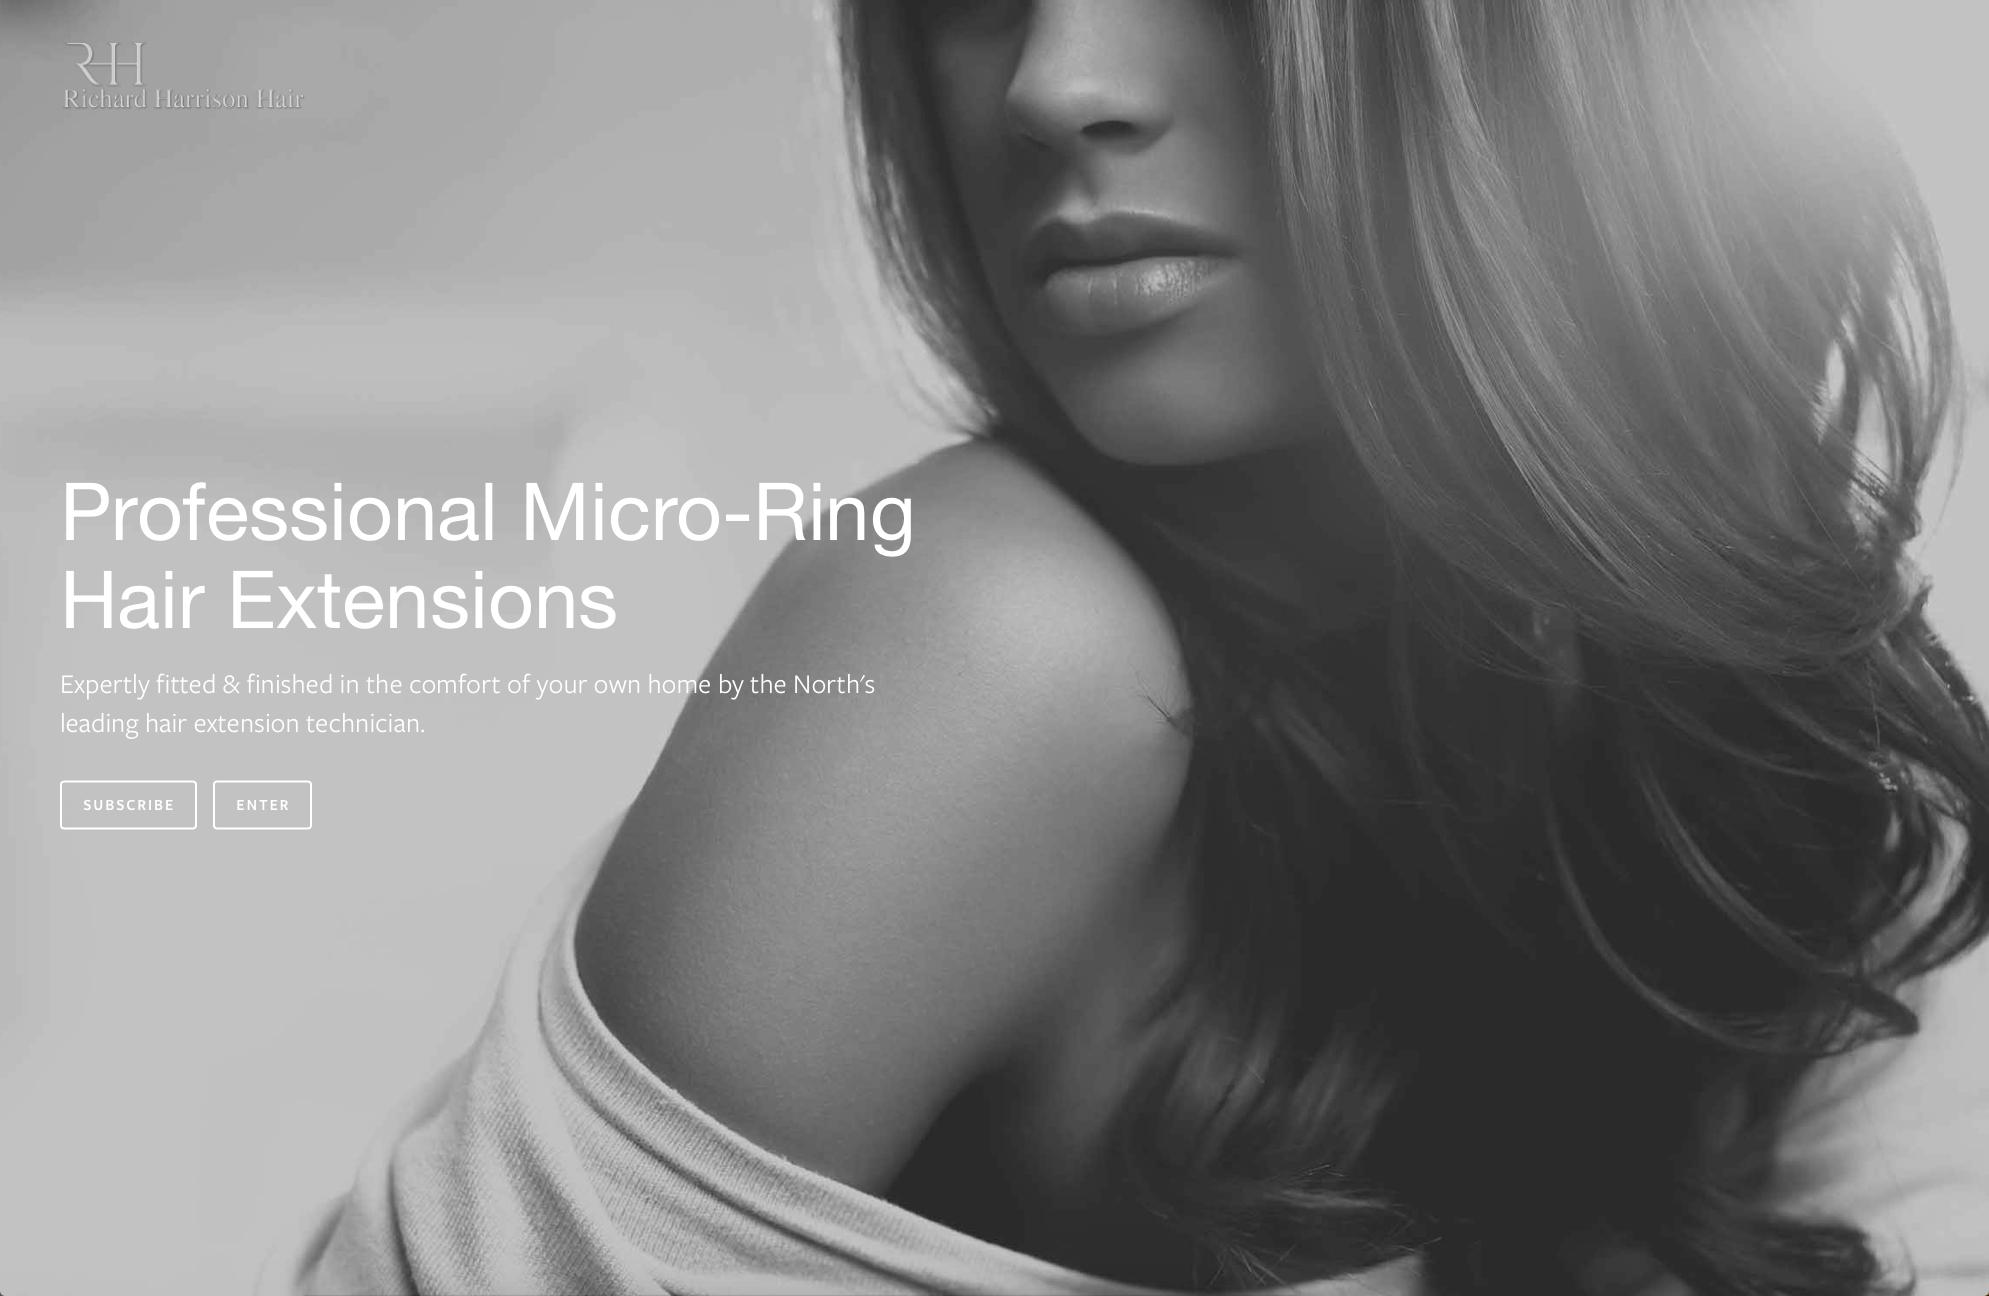 Lithium Design - Small Business Portfolio Richard Harrison Hair 1c